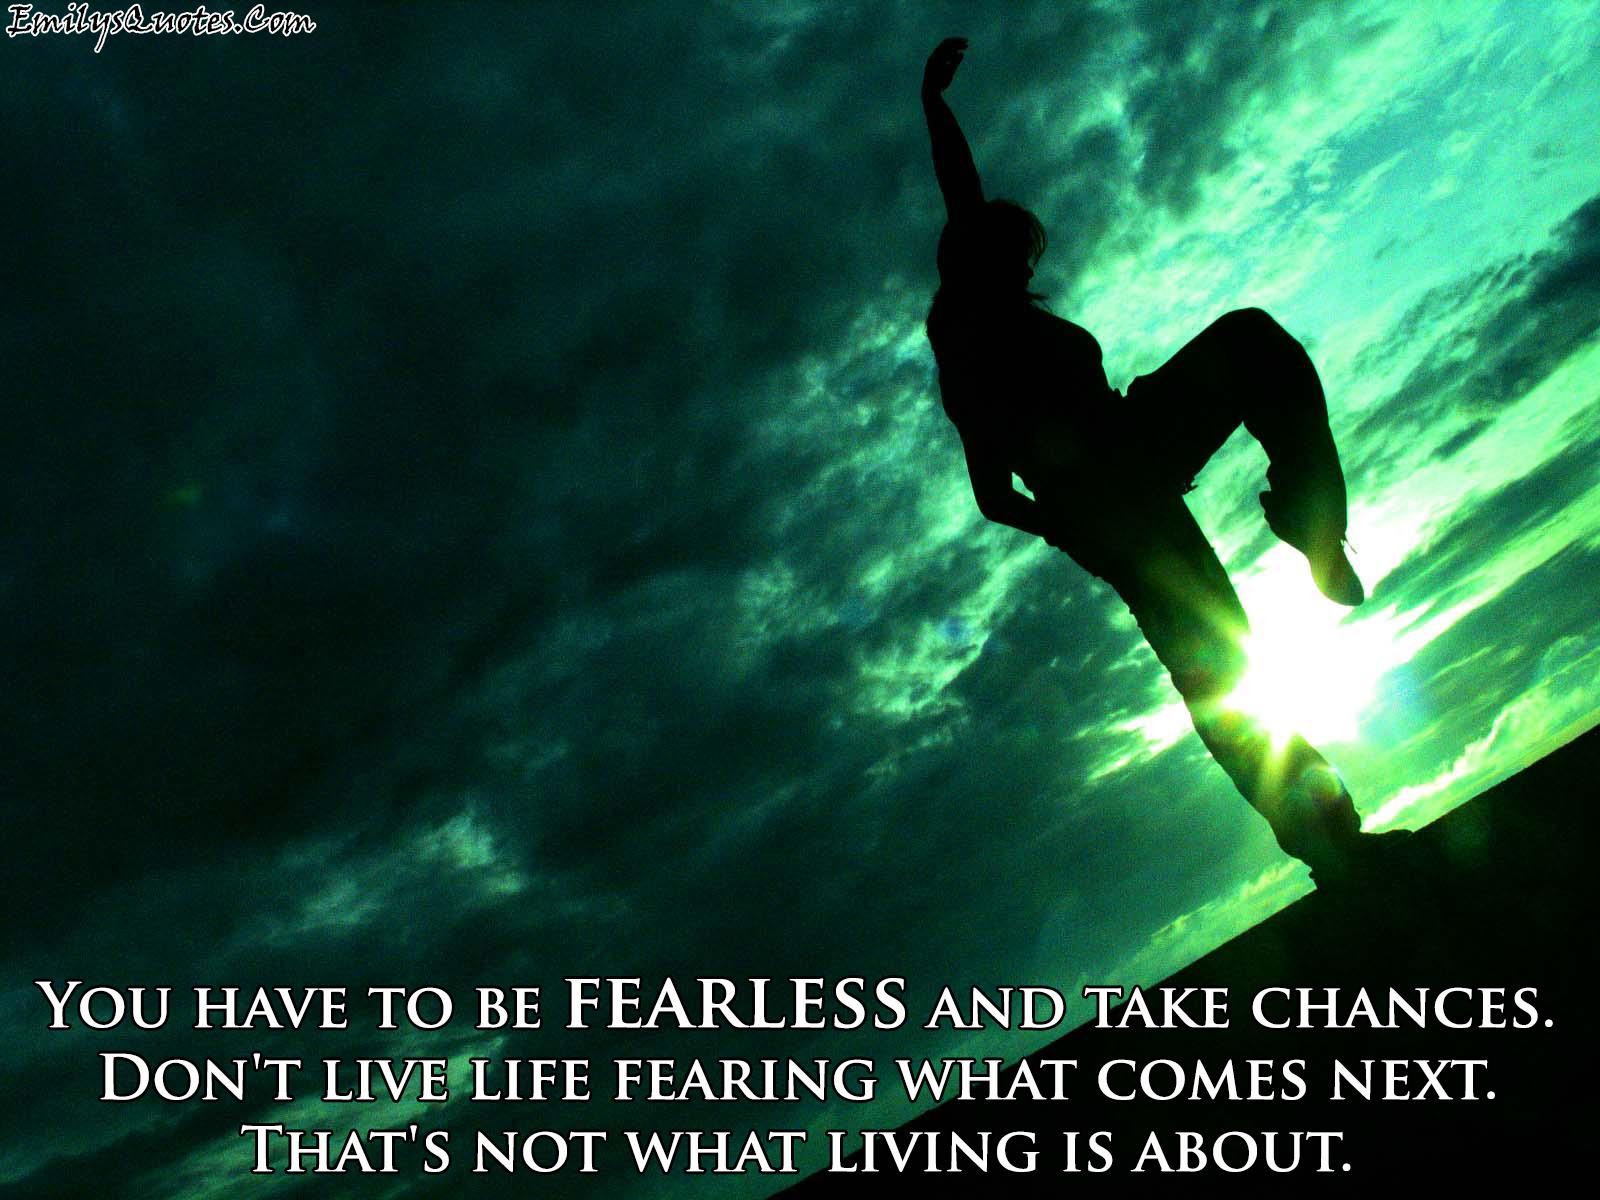 EmilysQuotes.Com - life, courage, fearless, wisdom